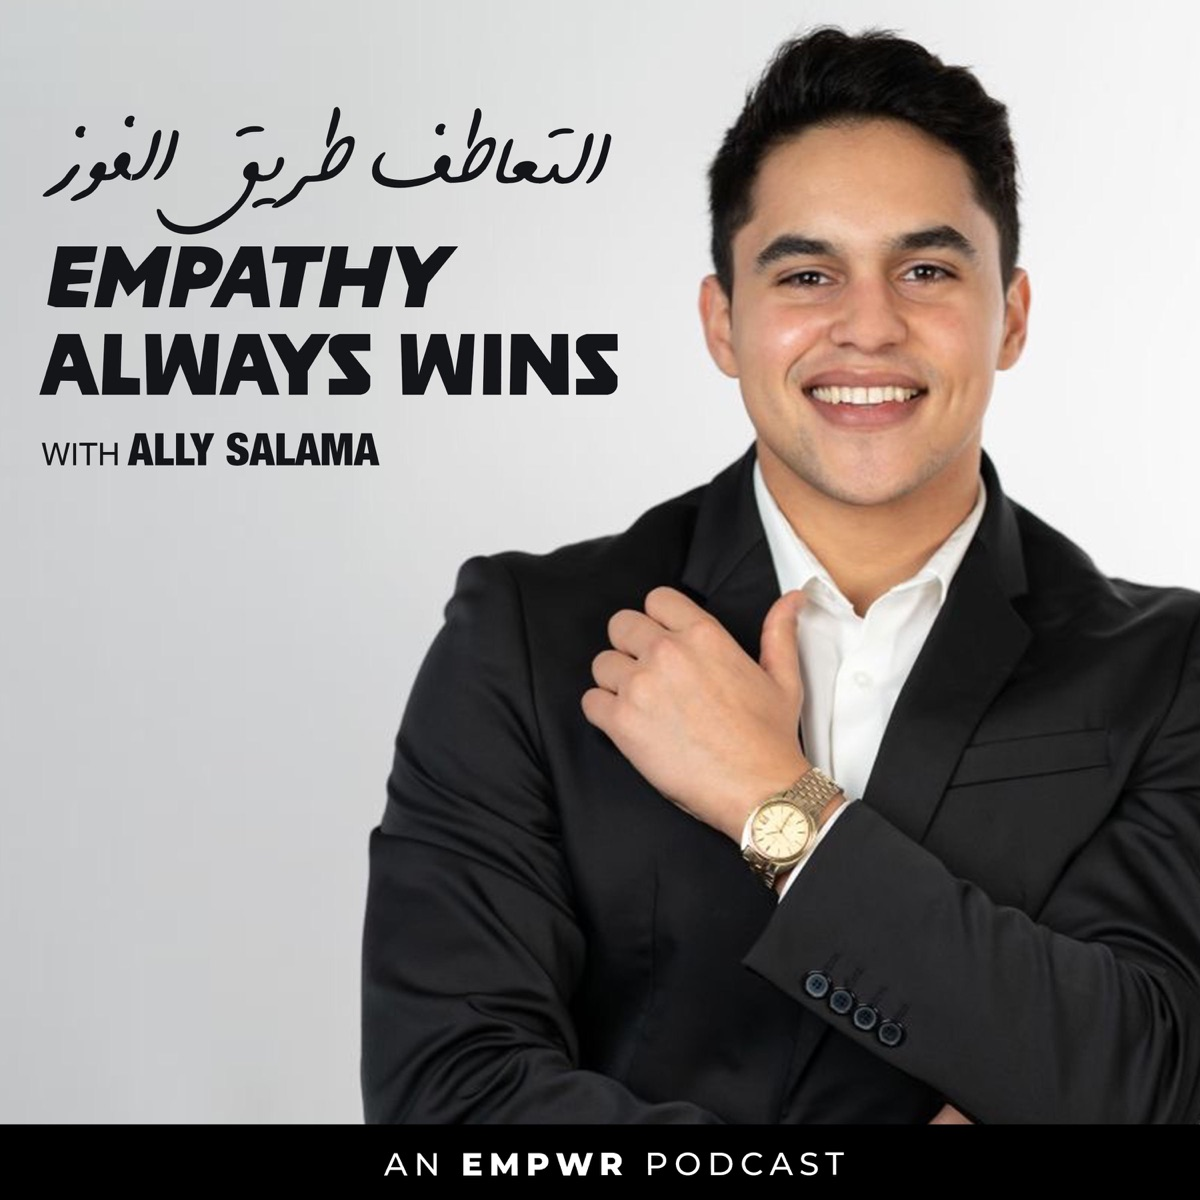 Empathy Always Wins with Ally Salama التعاطف طريق الفوز